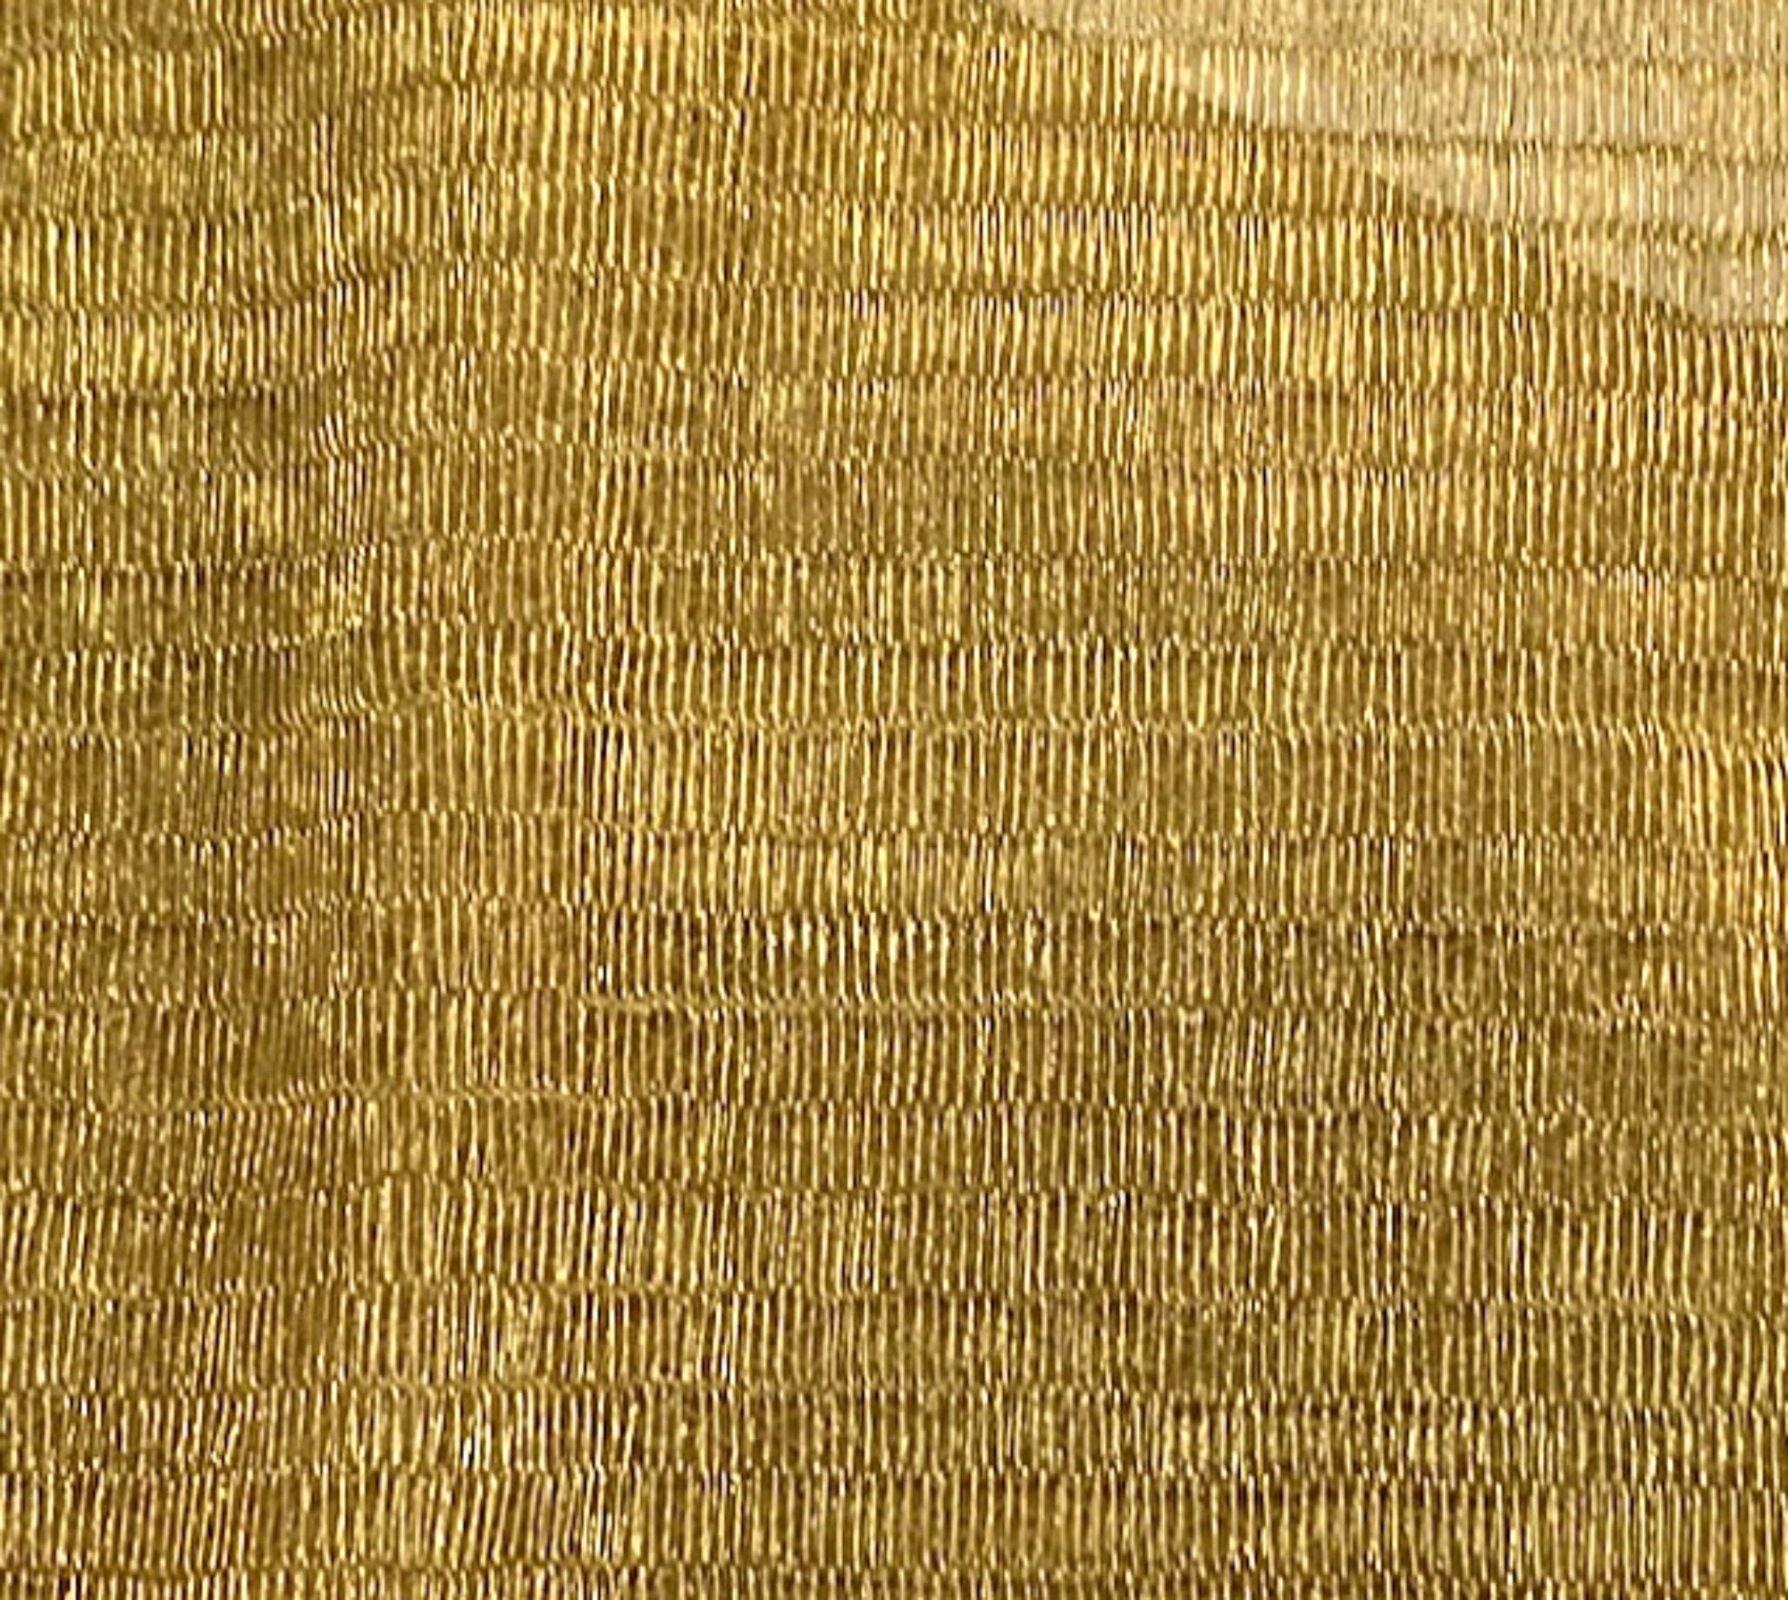 Richard Tyler Gold Metallic Mesh Made in France Apparel Sewing Fabric